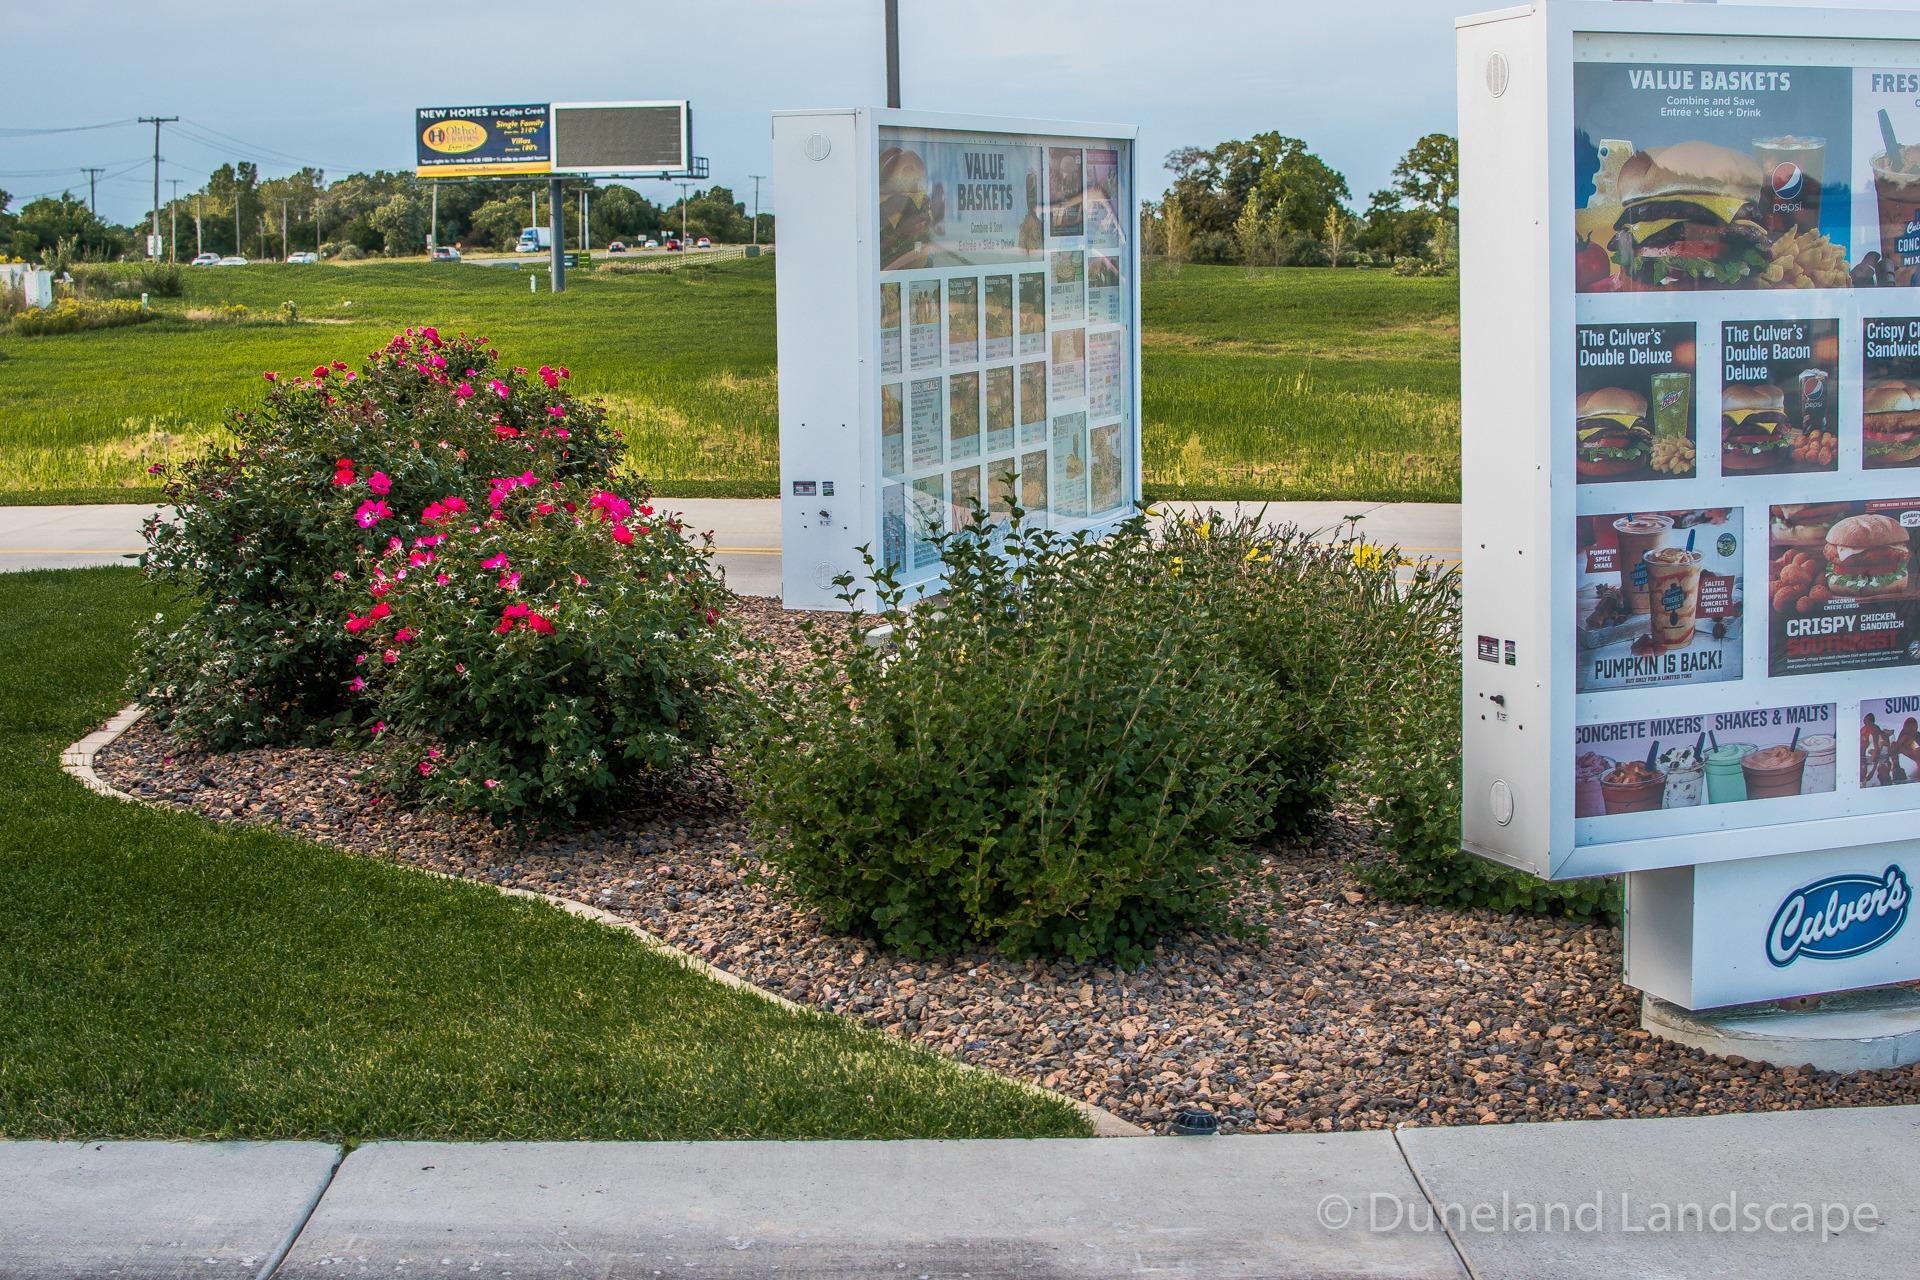 Landscaping at Culver's drive through menu